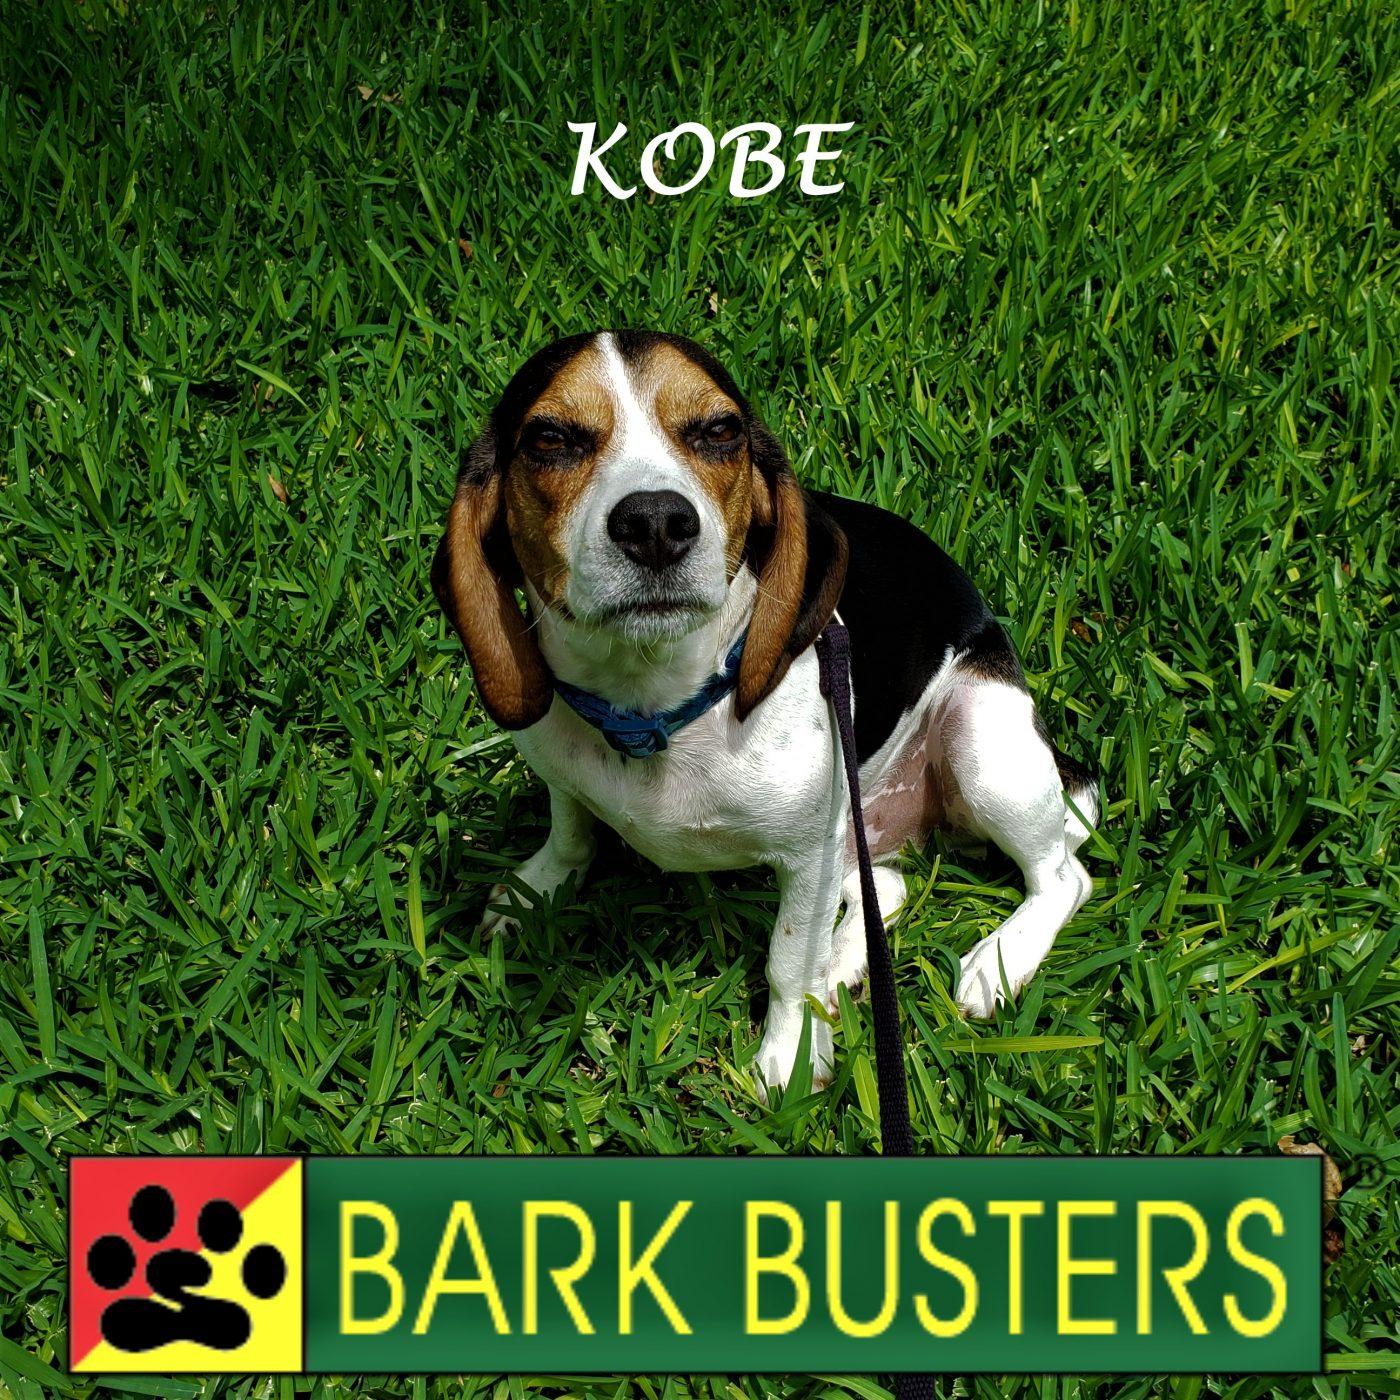 #beagle #dogaggressive #leashtraining #dogtraininghutto #dogtrainernearme #inhomedogtraining #barkbusters